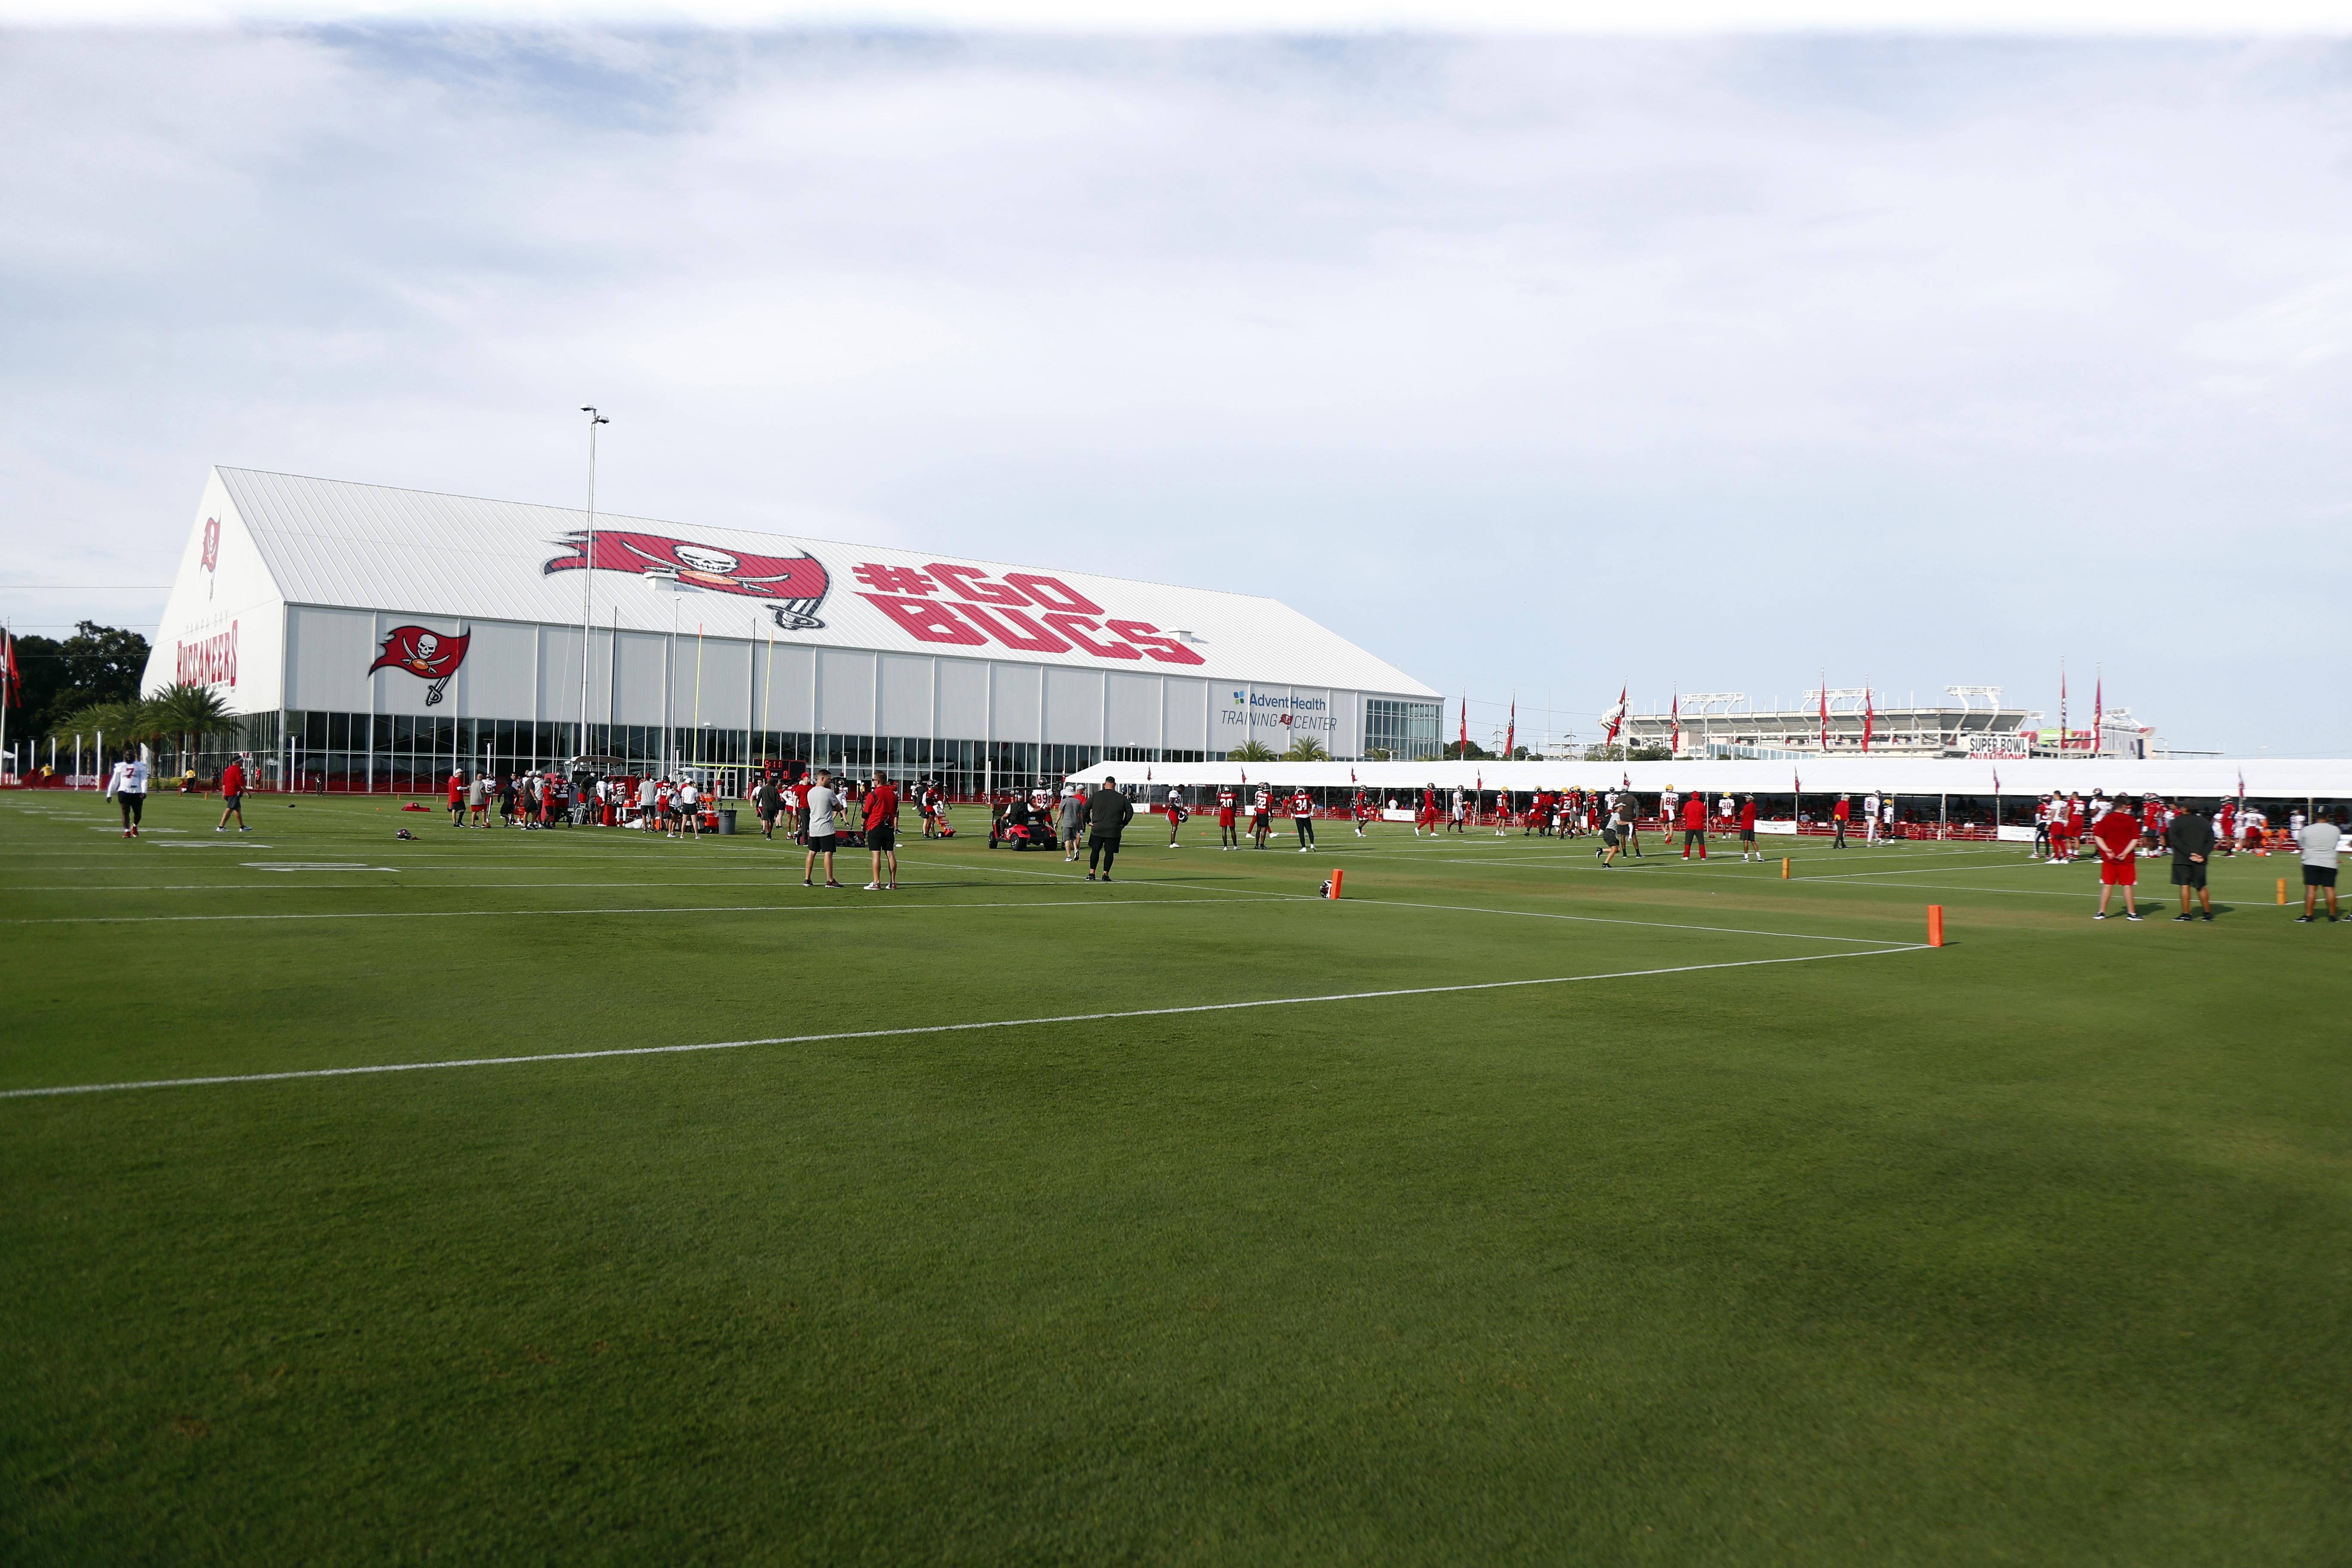 NFL: Tampa Bay Buccaneers Training Camp